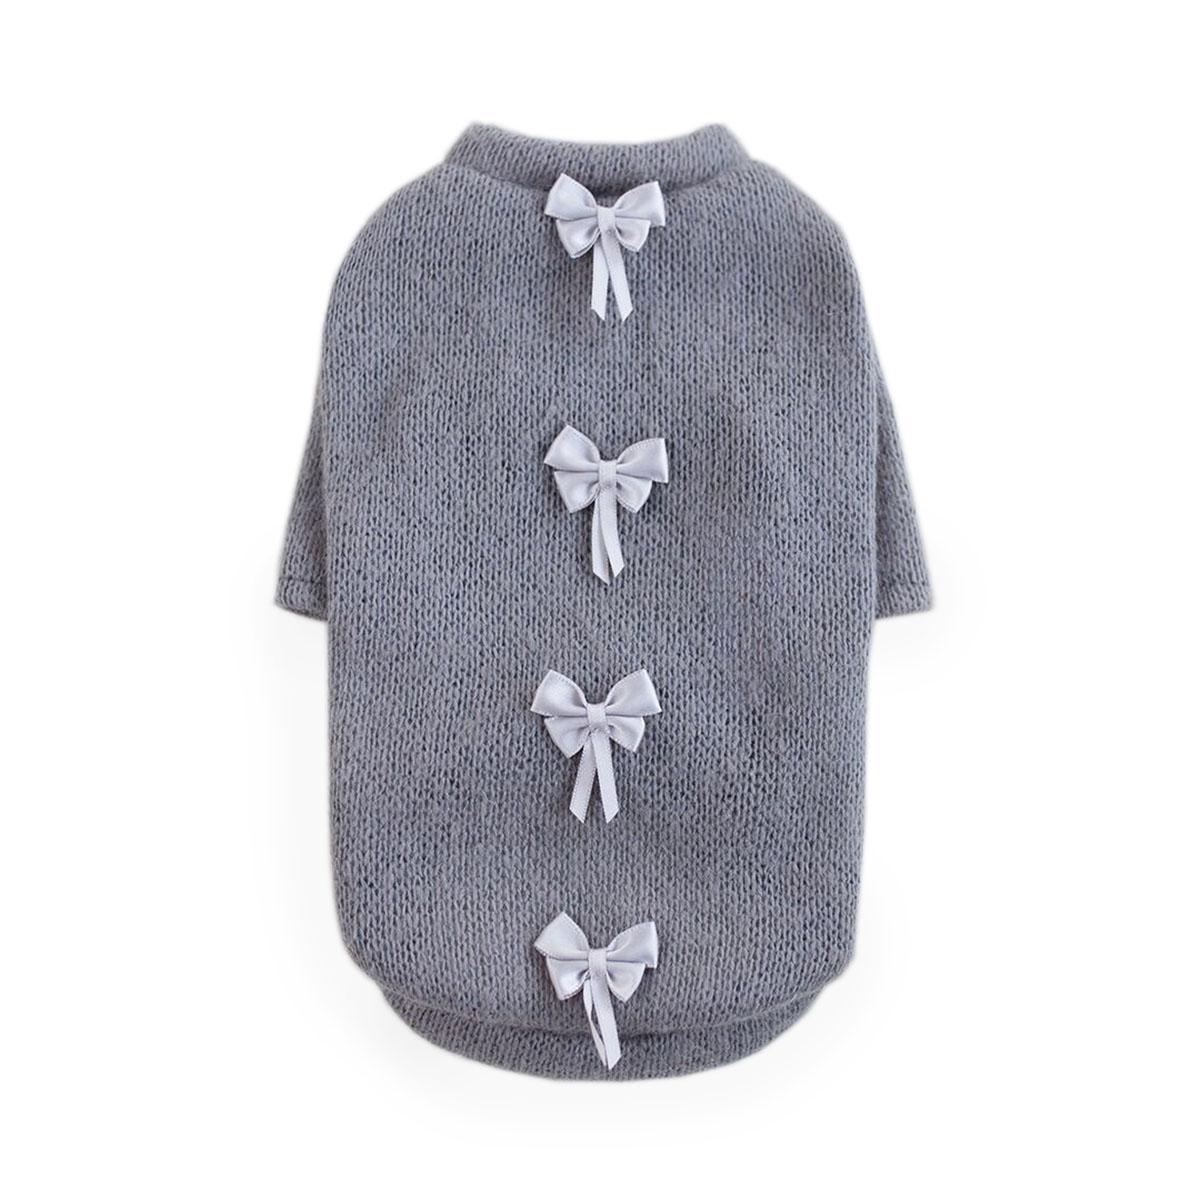 Dainty Bow Dog Sweater by Hello Doggie - Gray